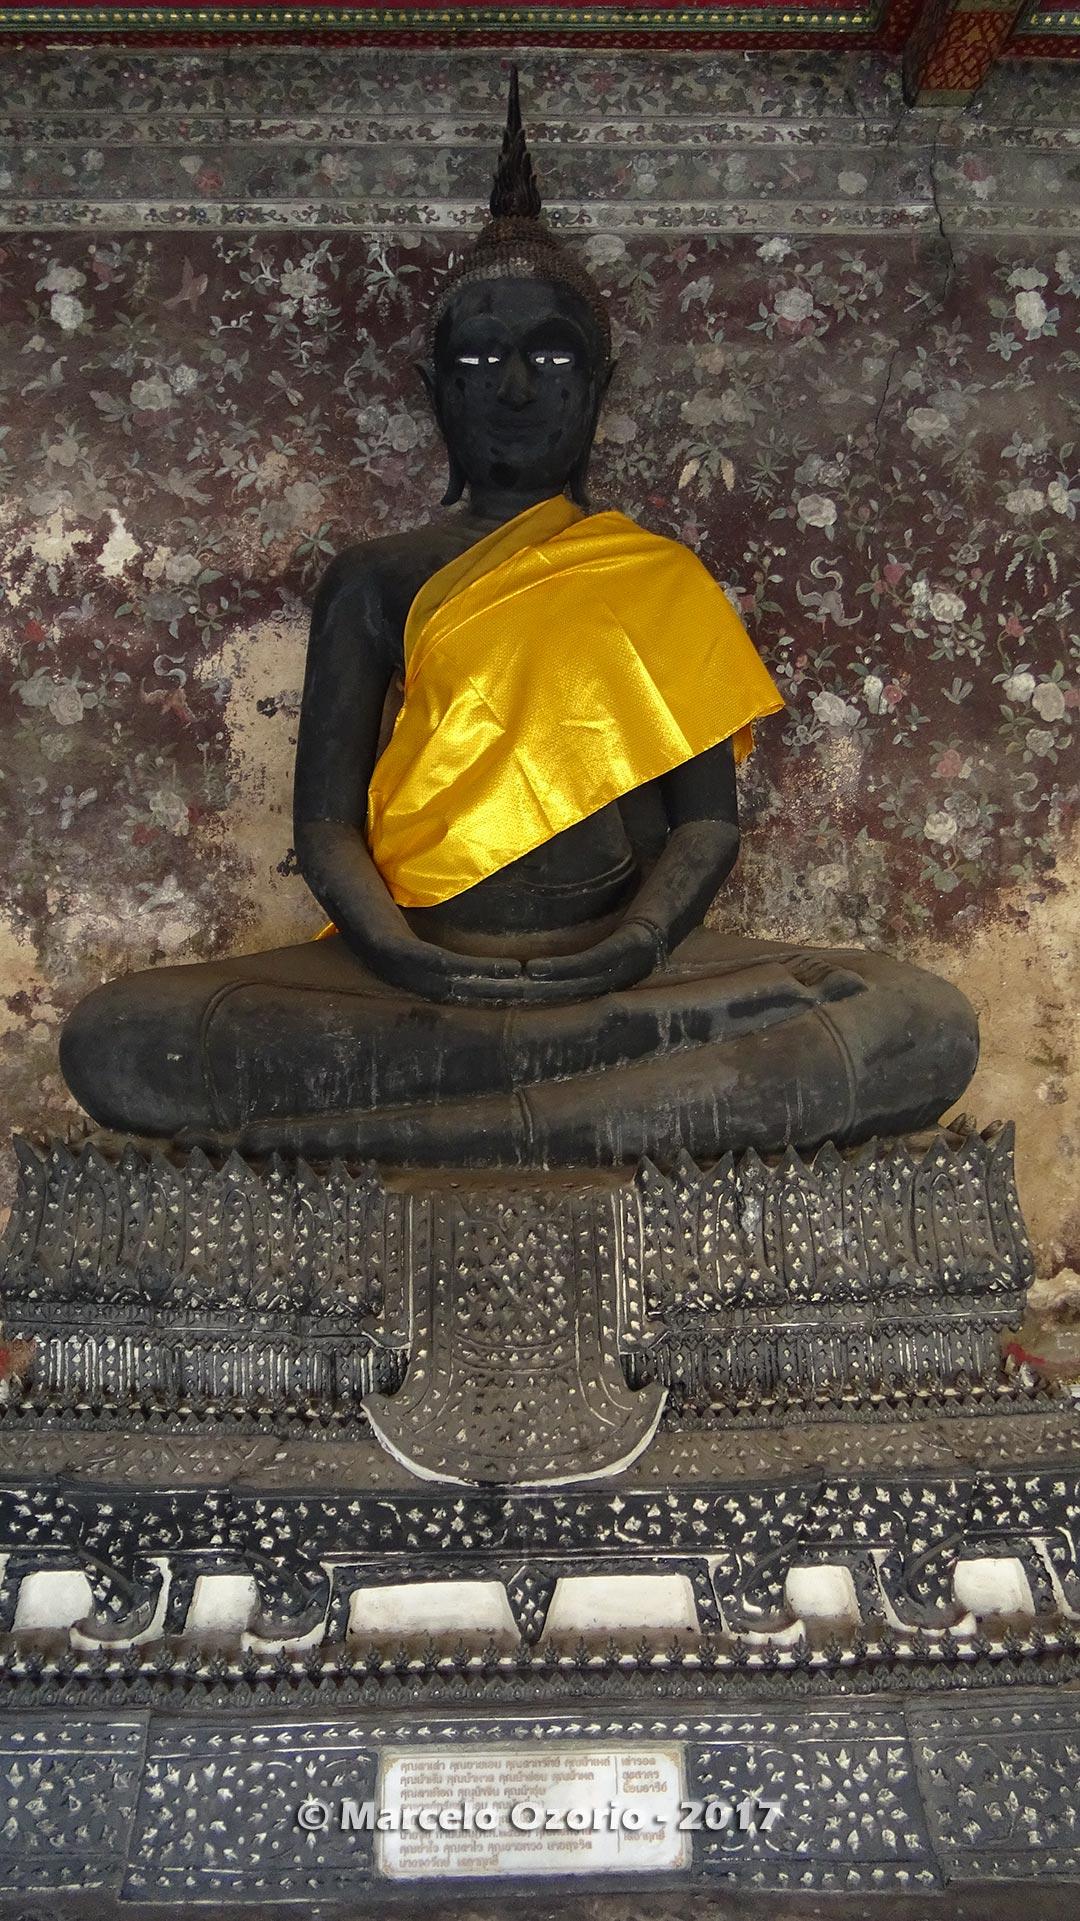 budhas bangkok thailand serie 4 - Buddhas of Bangkok - Thailand